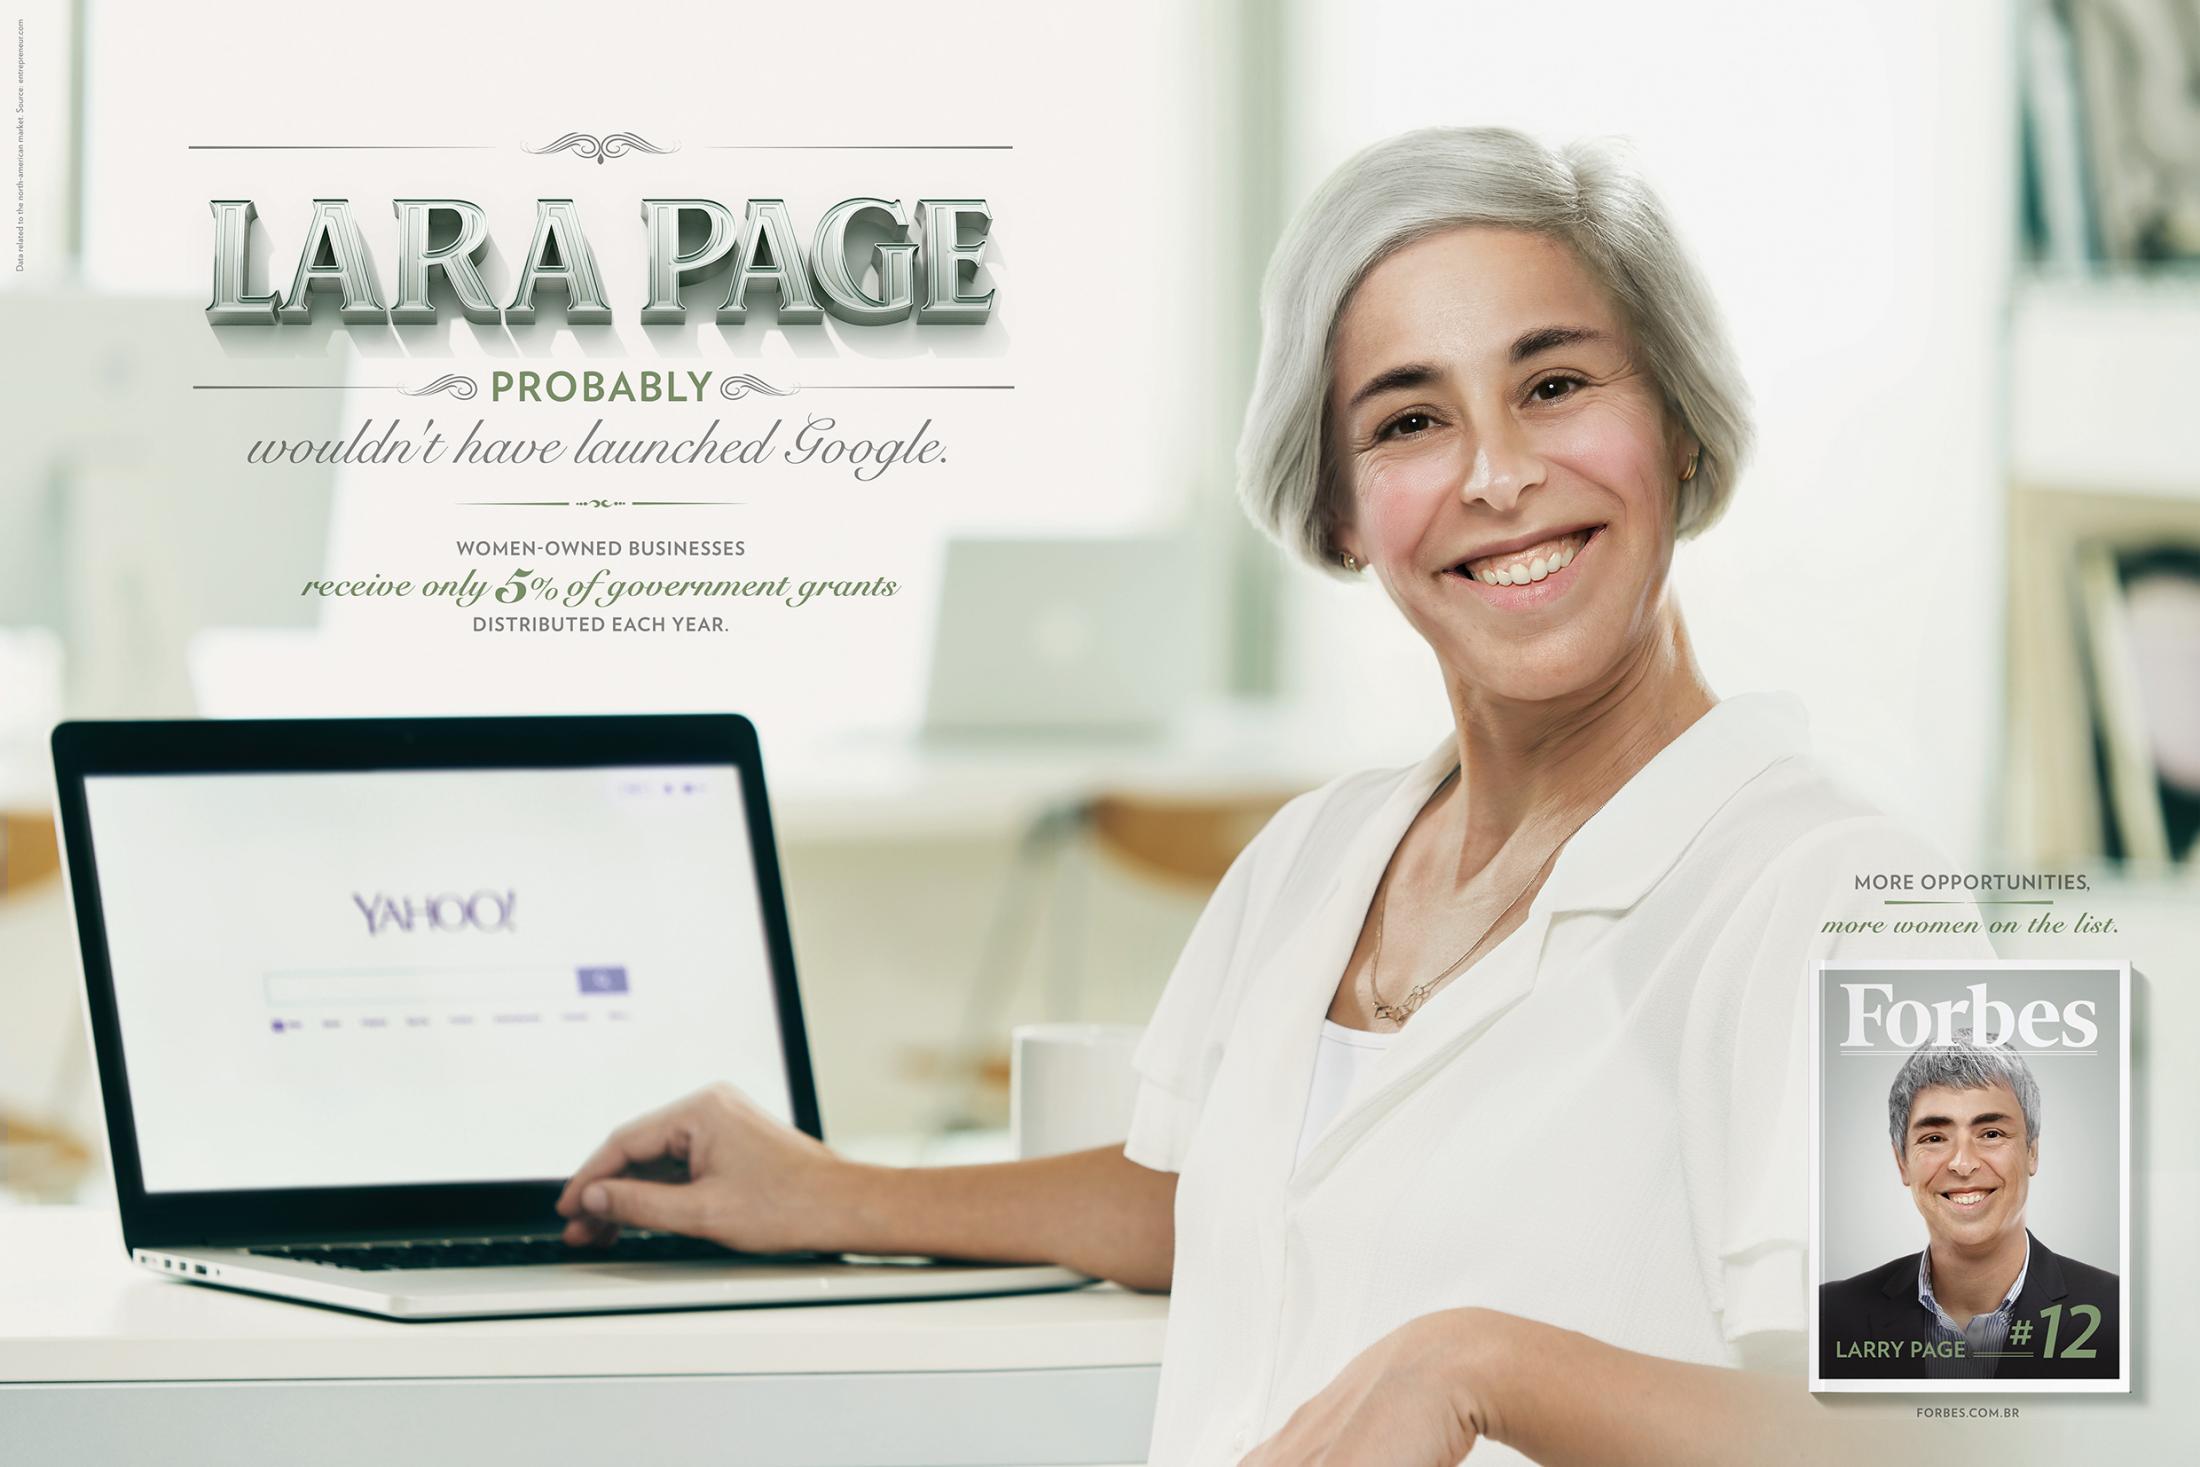 Forbes Print Ad - Lara Page